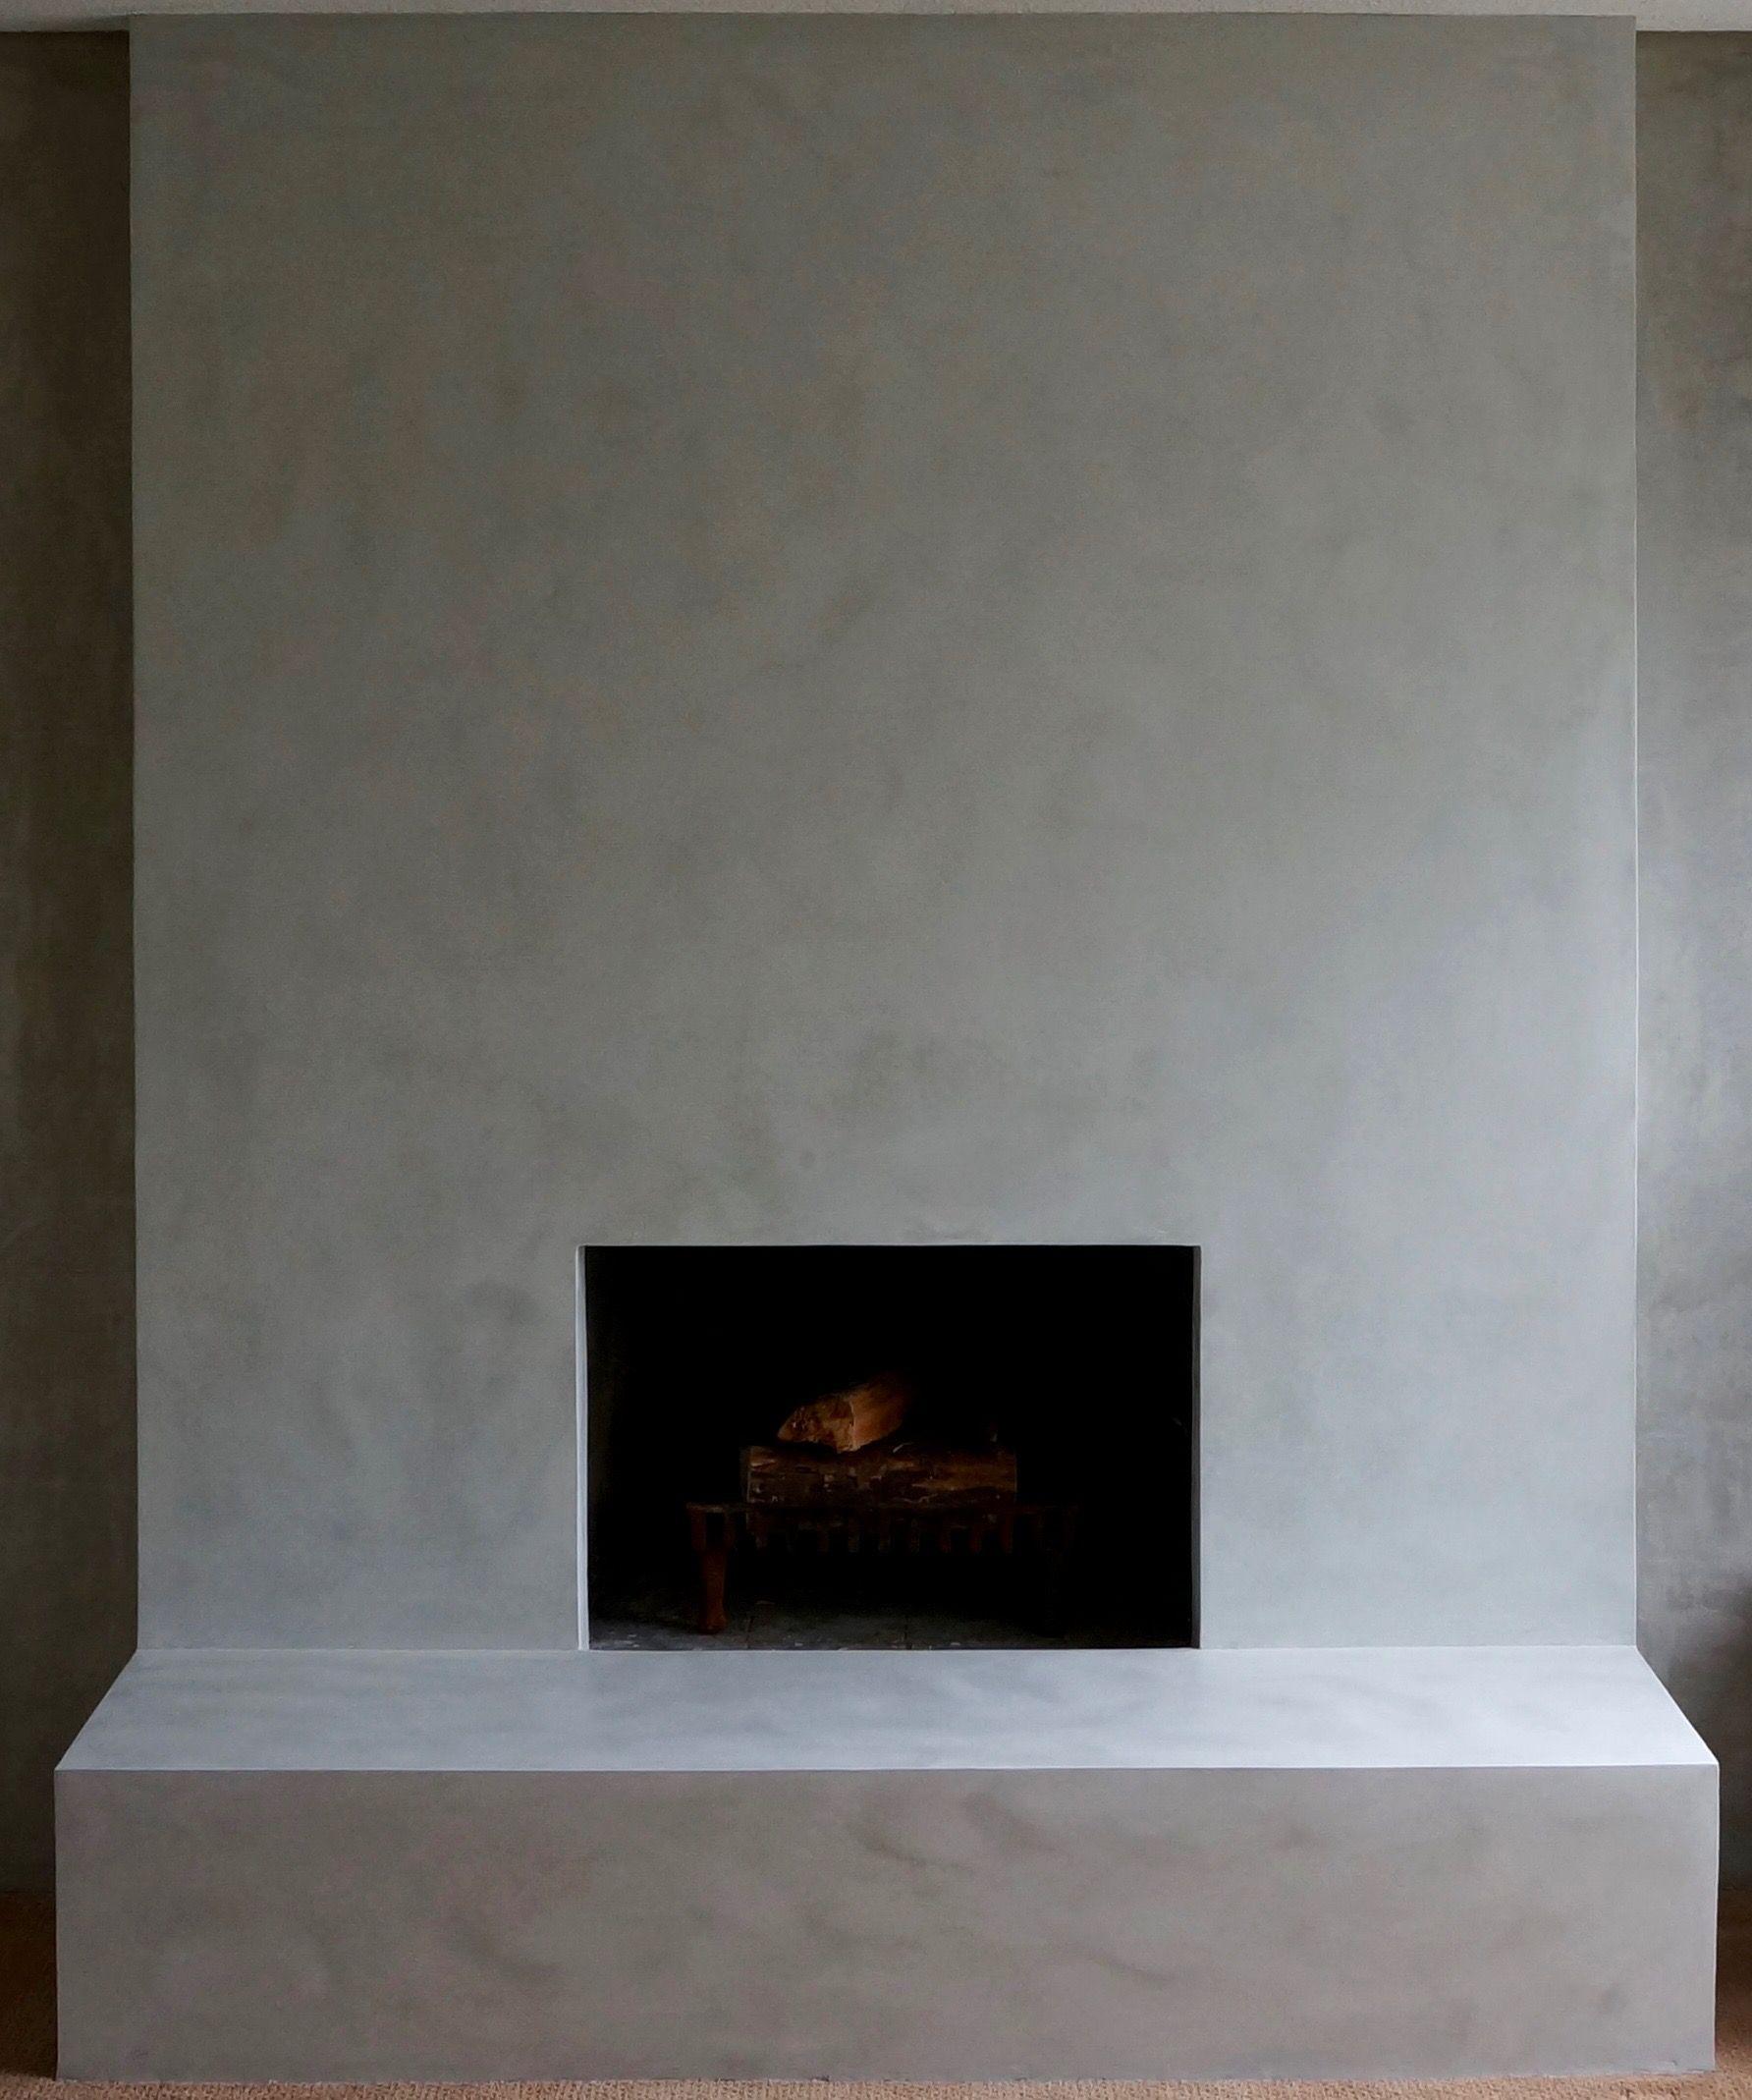 Polished Lime Plaster Fireplace Looks Like Limestone Plaster Fireplaces Pinterest Living